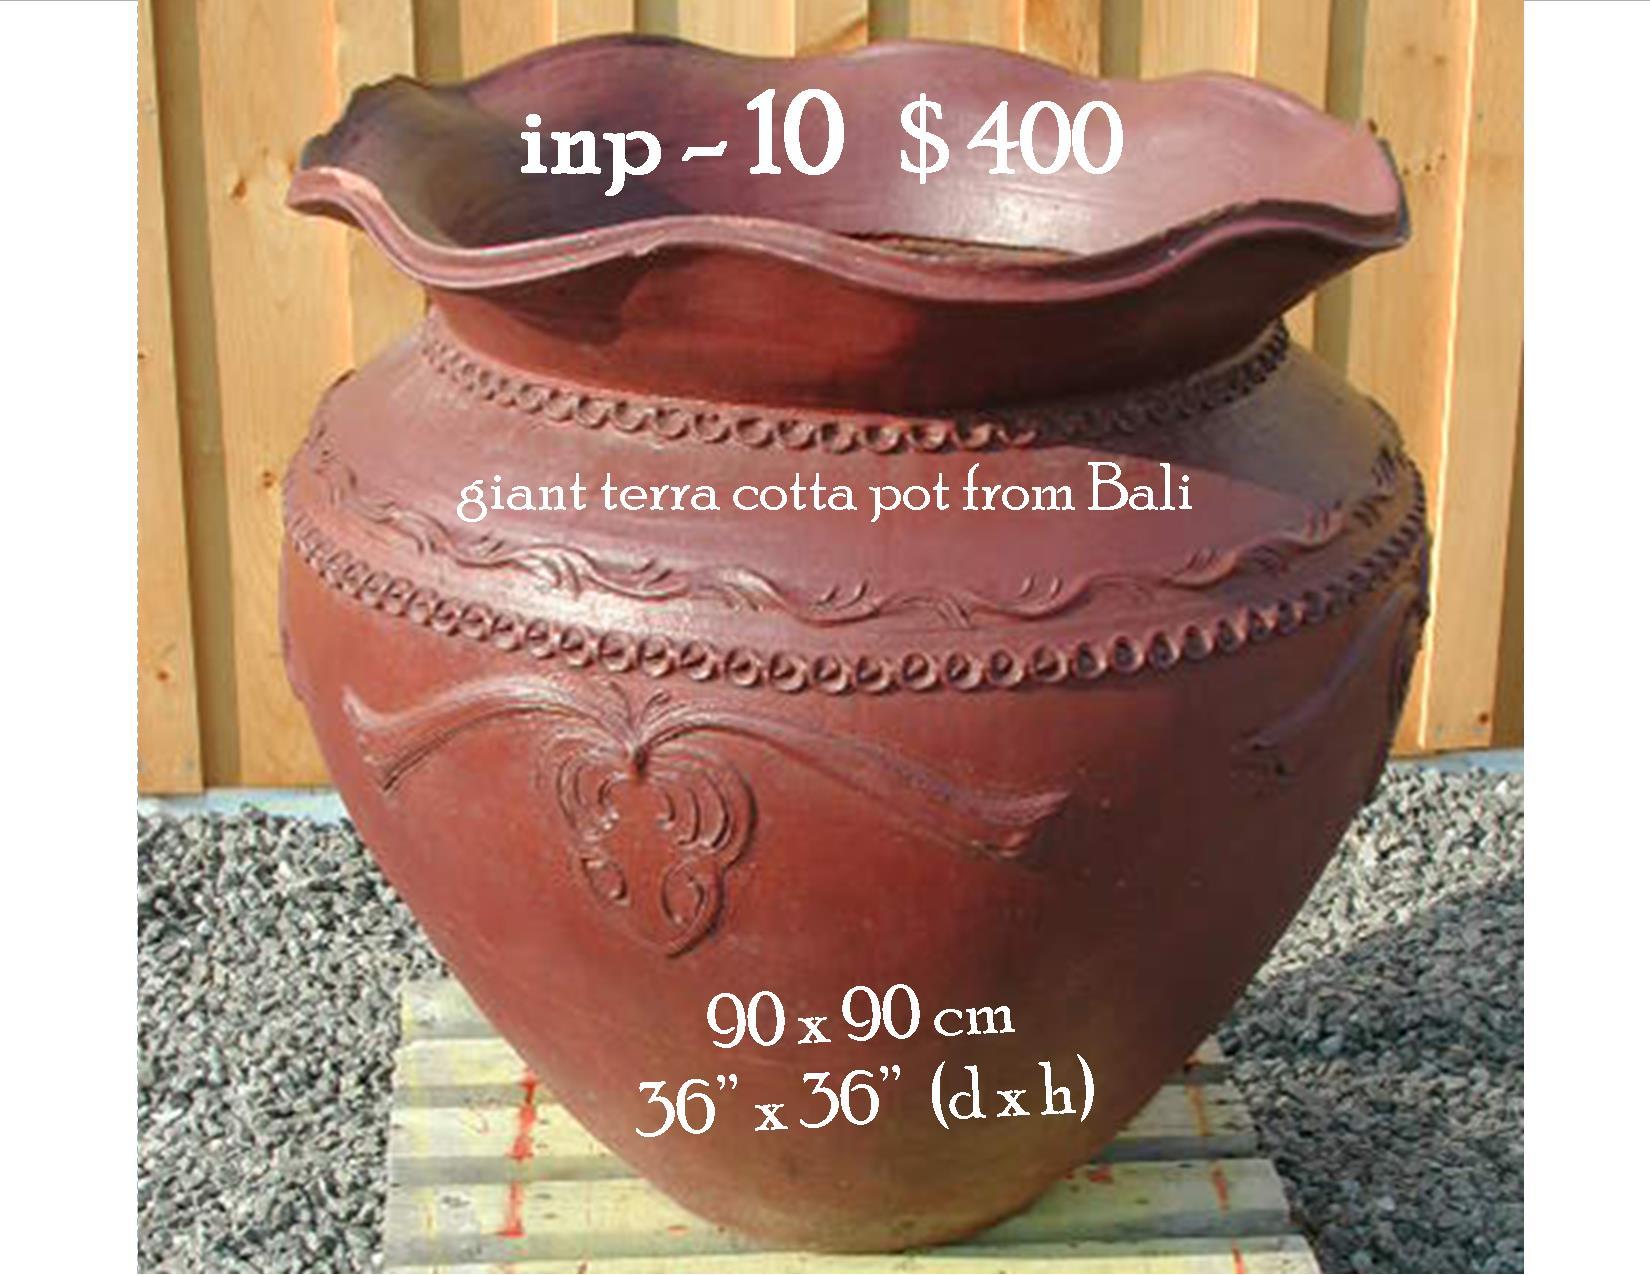 inp-10 giant terra cotta pot from Bali